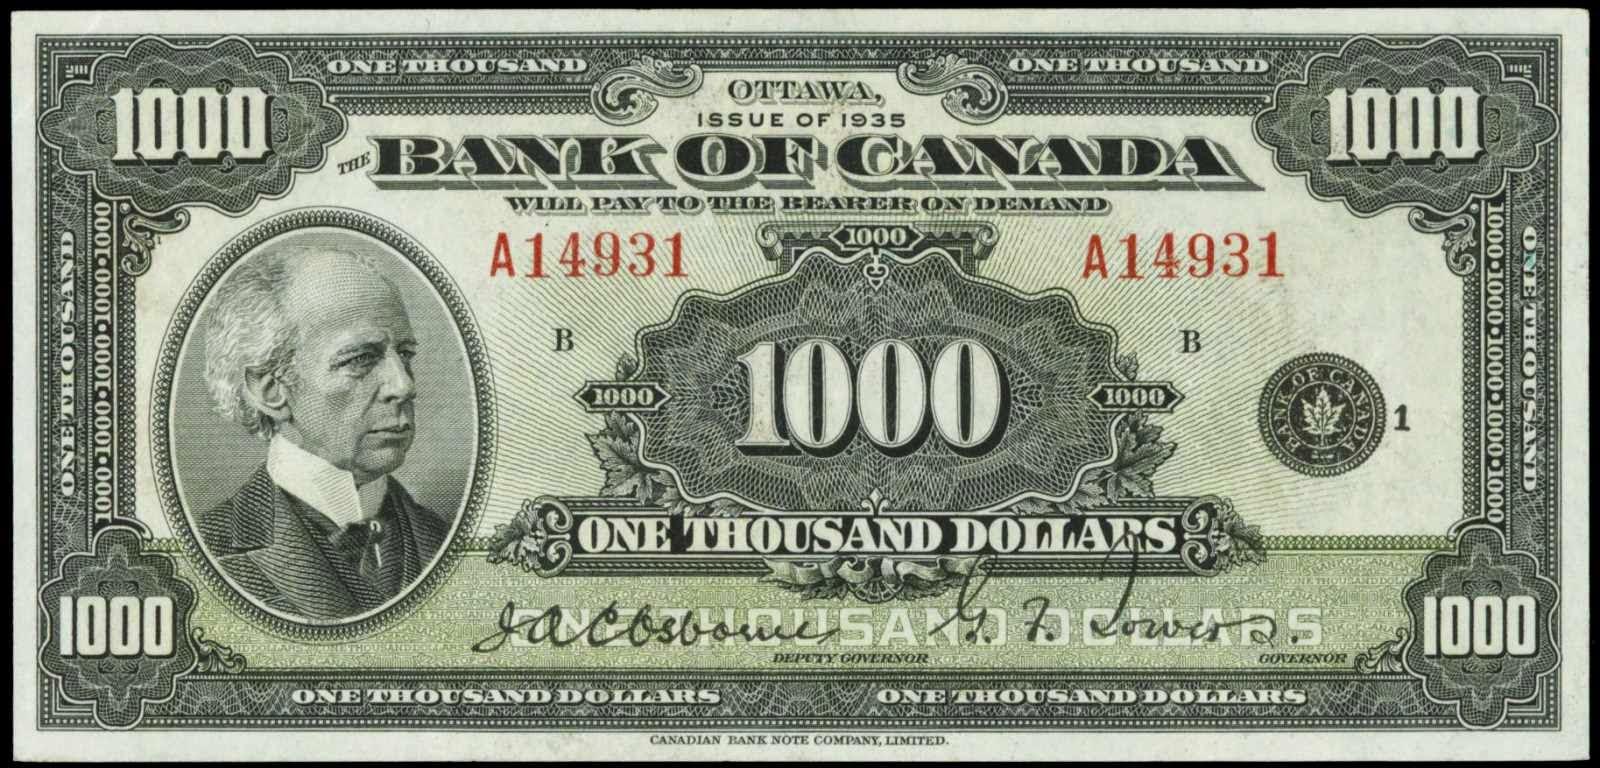 Bank of Canada banknotes 1935 1000 Dollars note